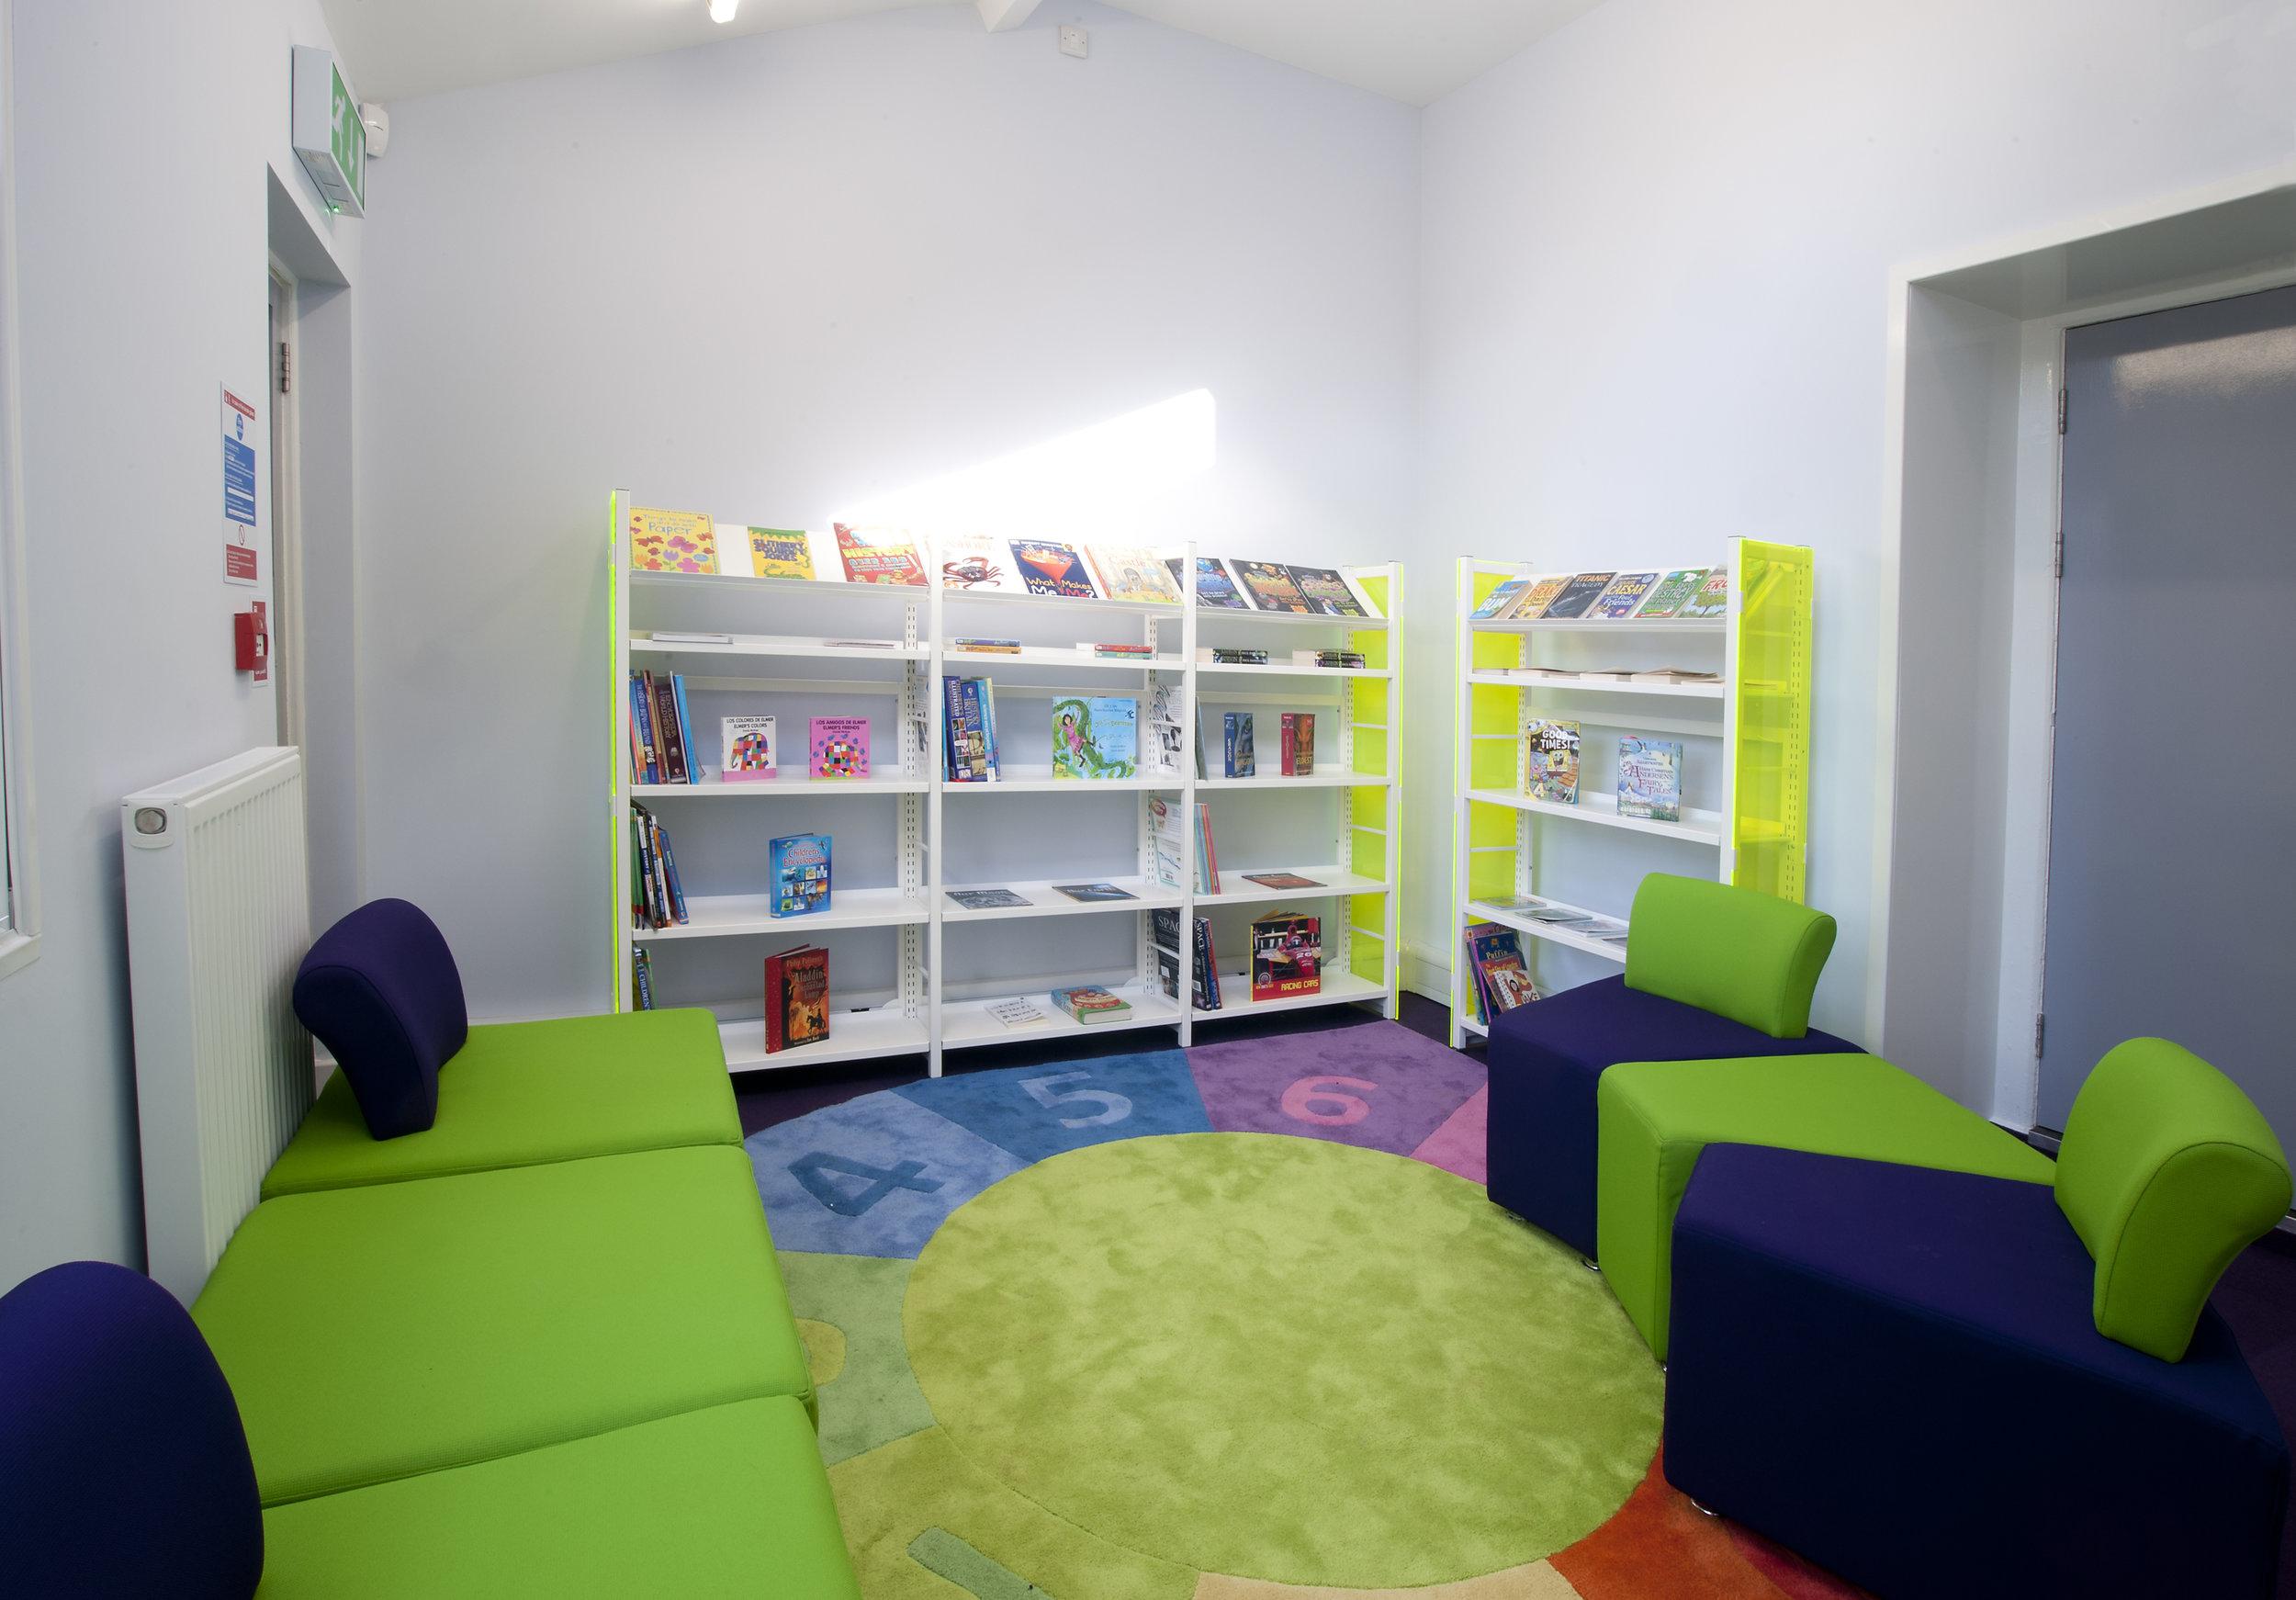 All Saints school library_03.jpg